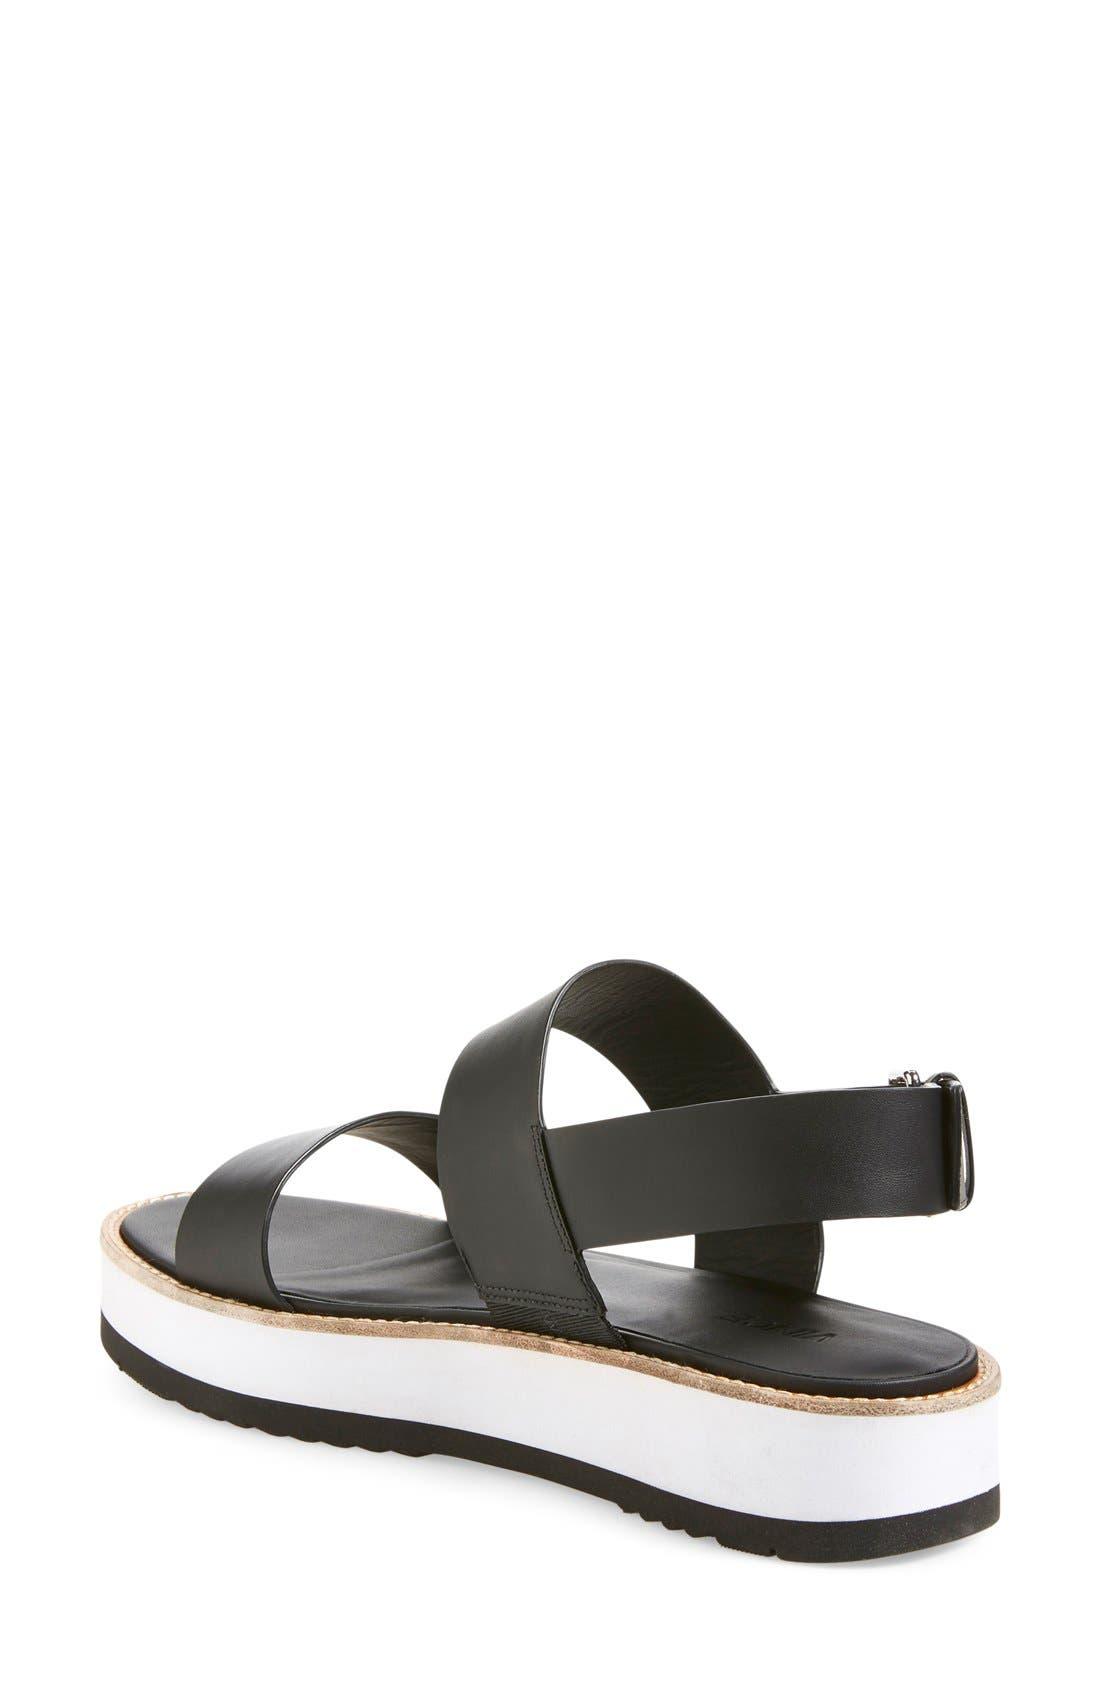 VINCE, 'Mana' Flatform Sandal, Alternate thumbnail 4, color, 001